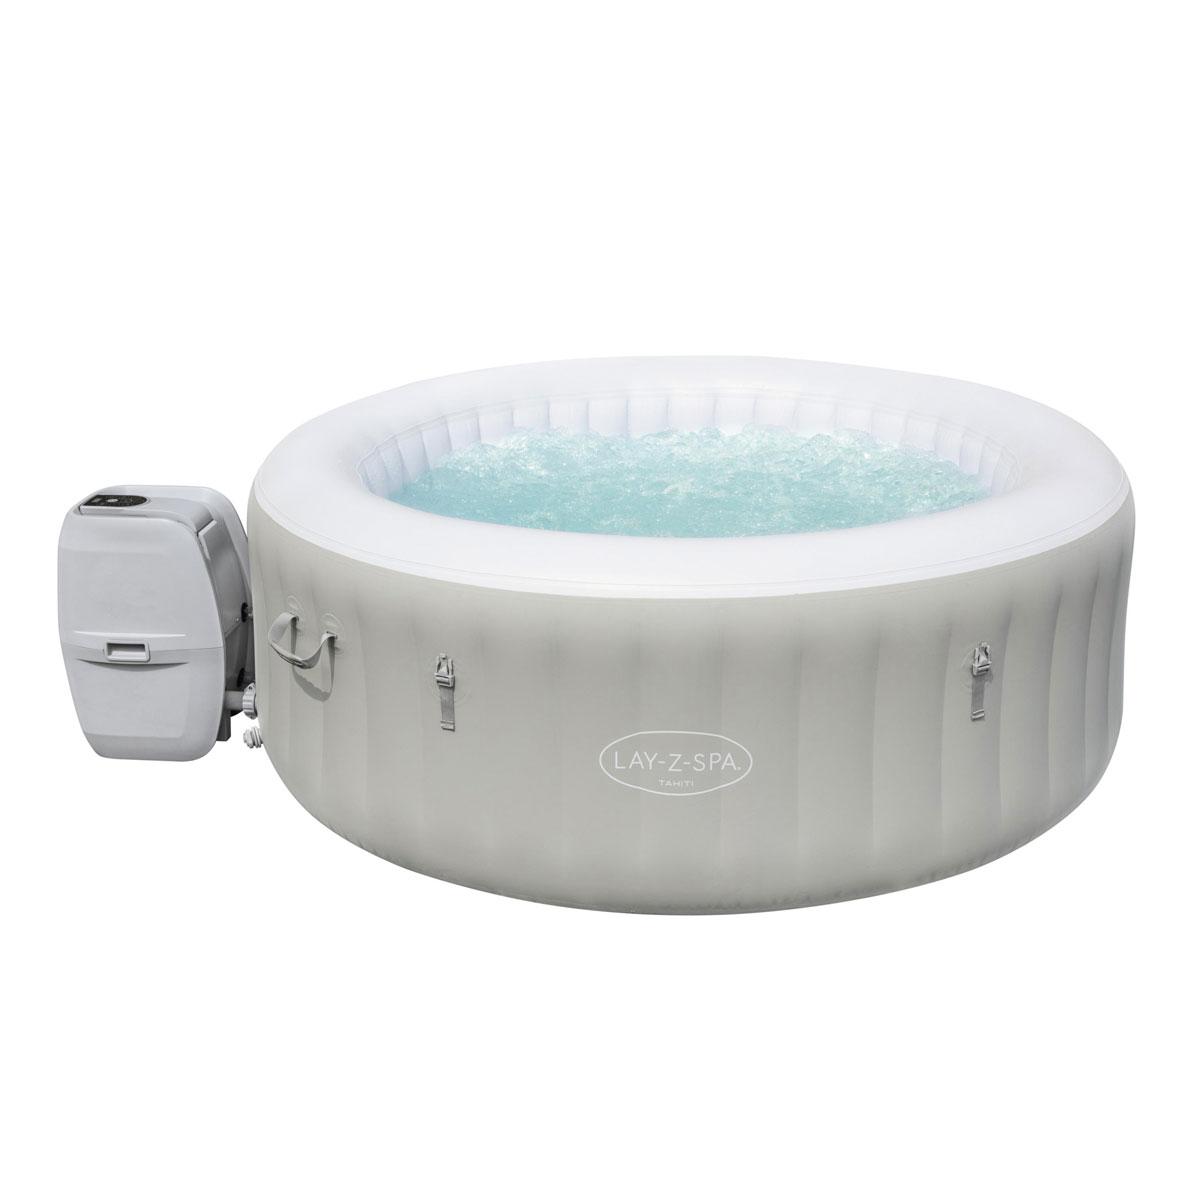 "Bestway Air-Jet Whirlpool ""Tahiti"", mit LED-Beleuchtung, 180x66 cm"